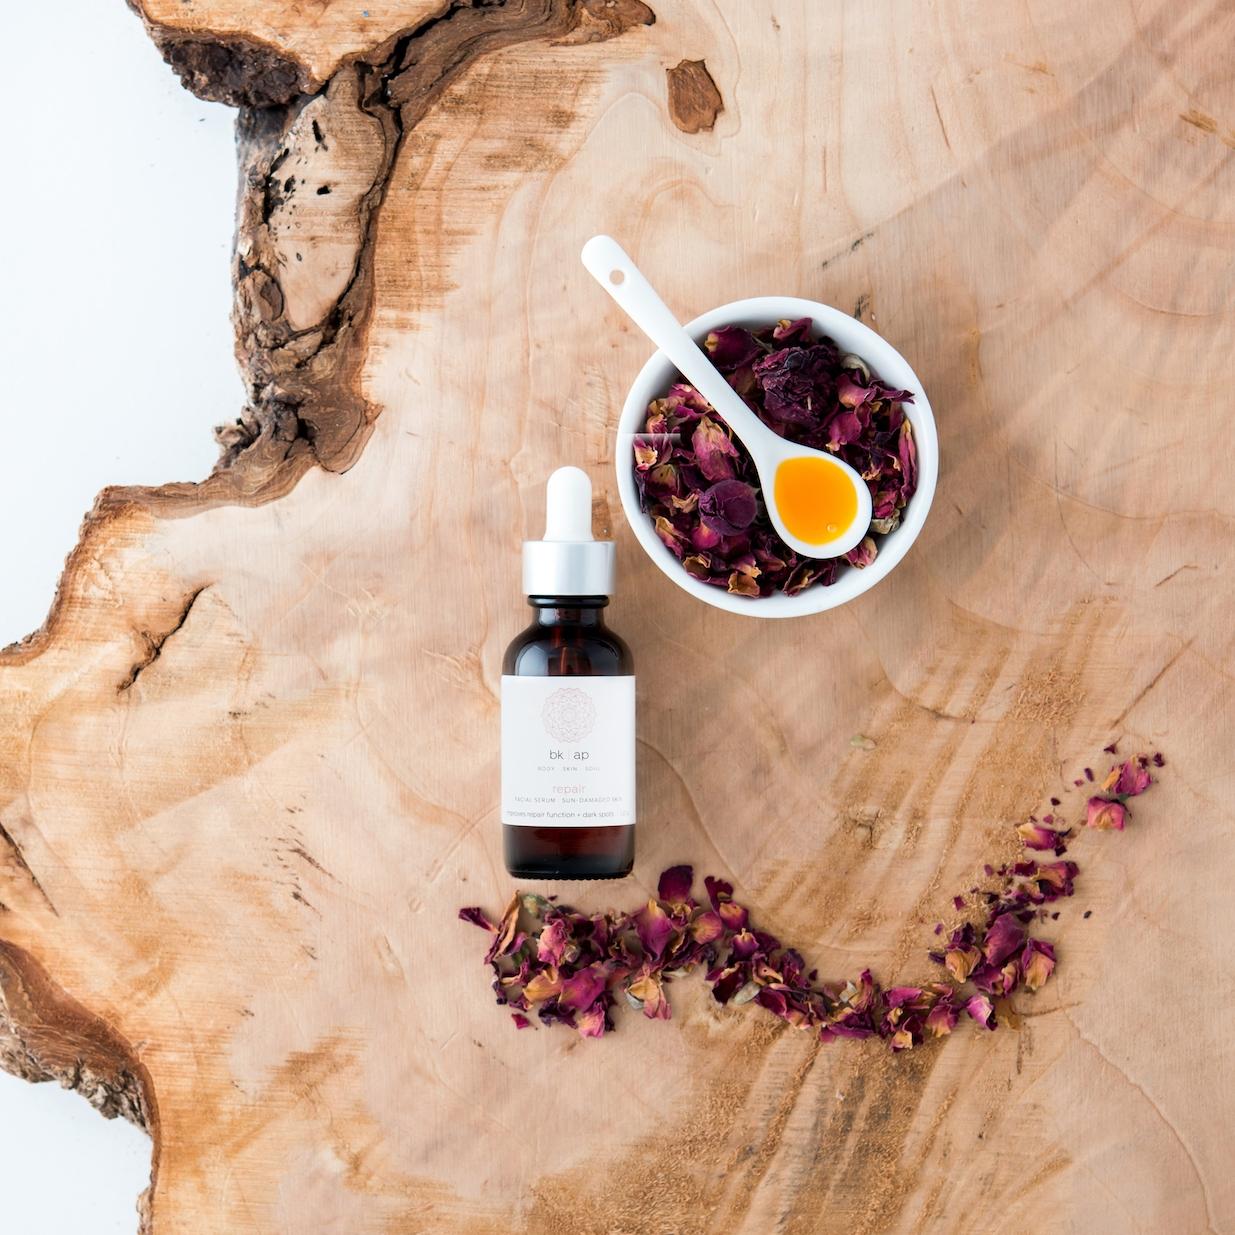 bk apothecary   Herbalist designed skincare